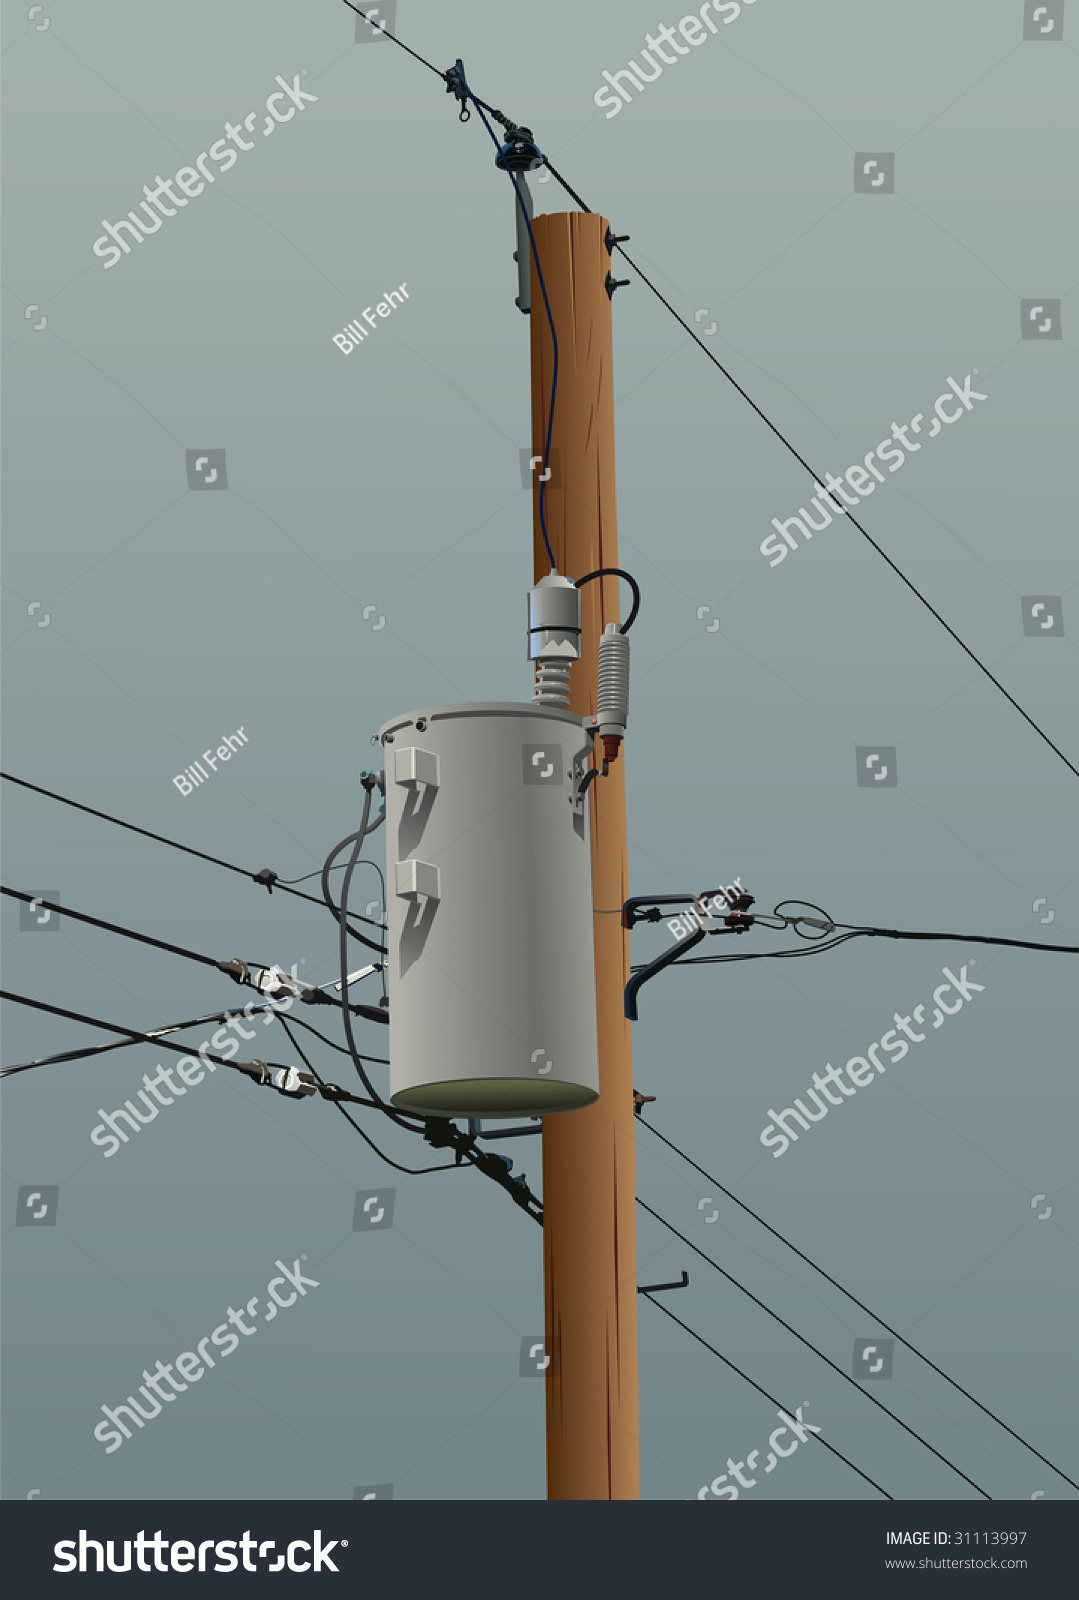 Electrical Transformer Wiring Diagram Merzienet - Wiring diagram doorbell transformer